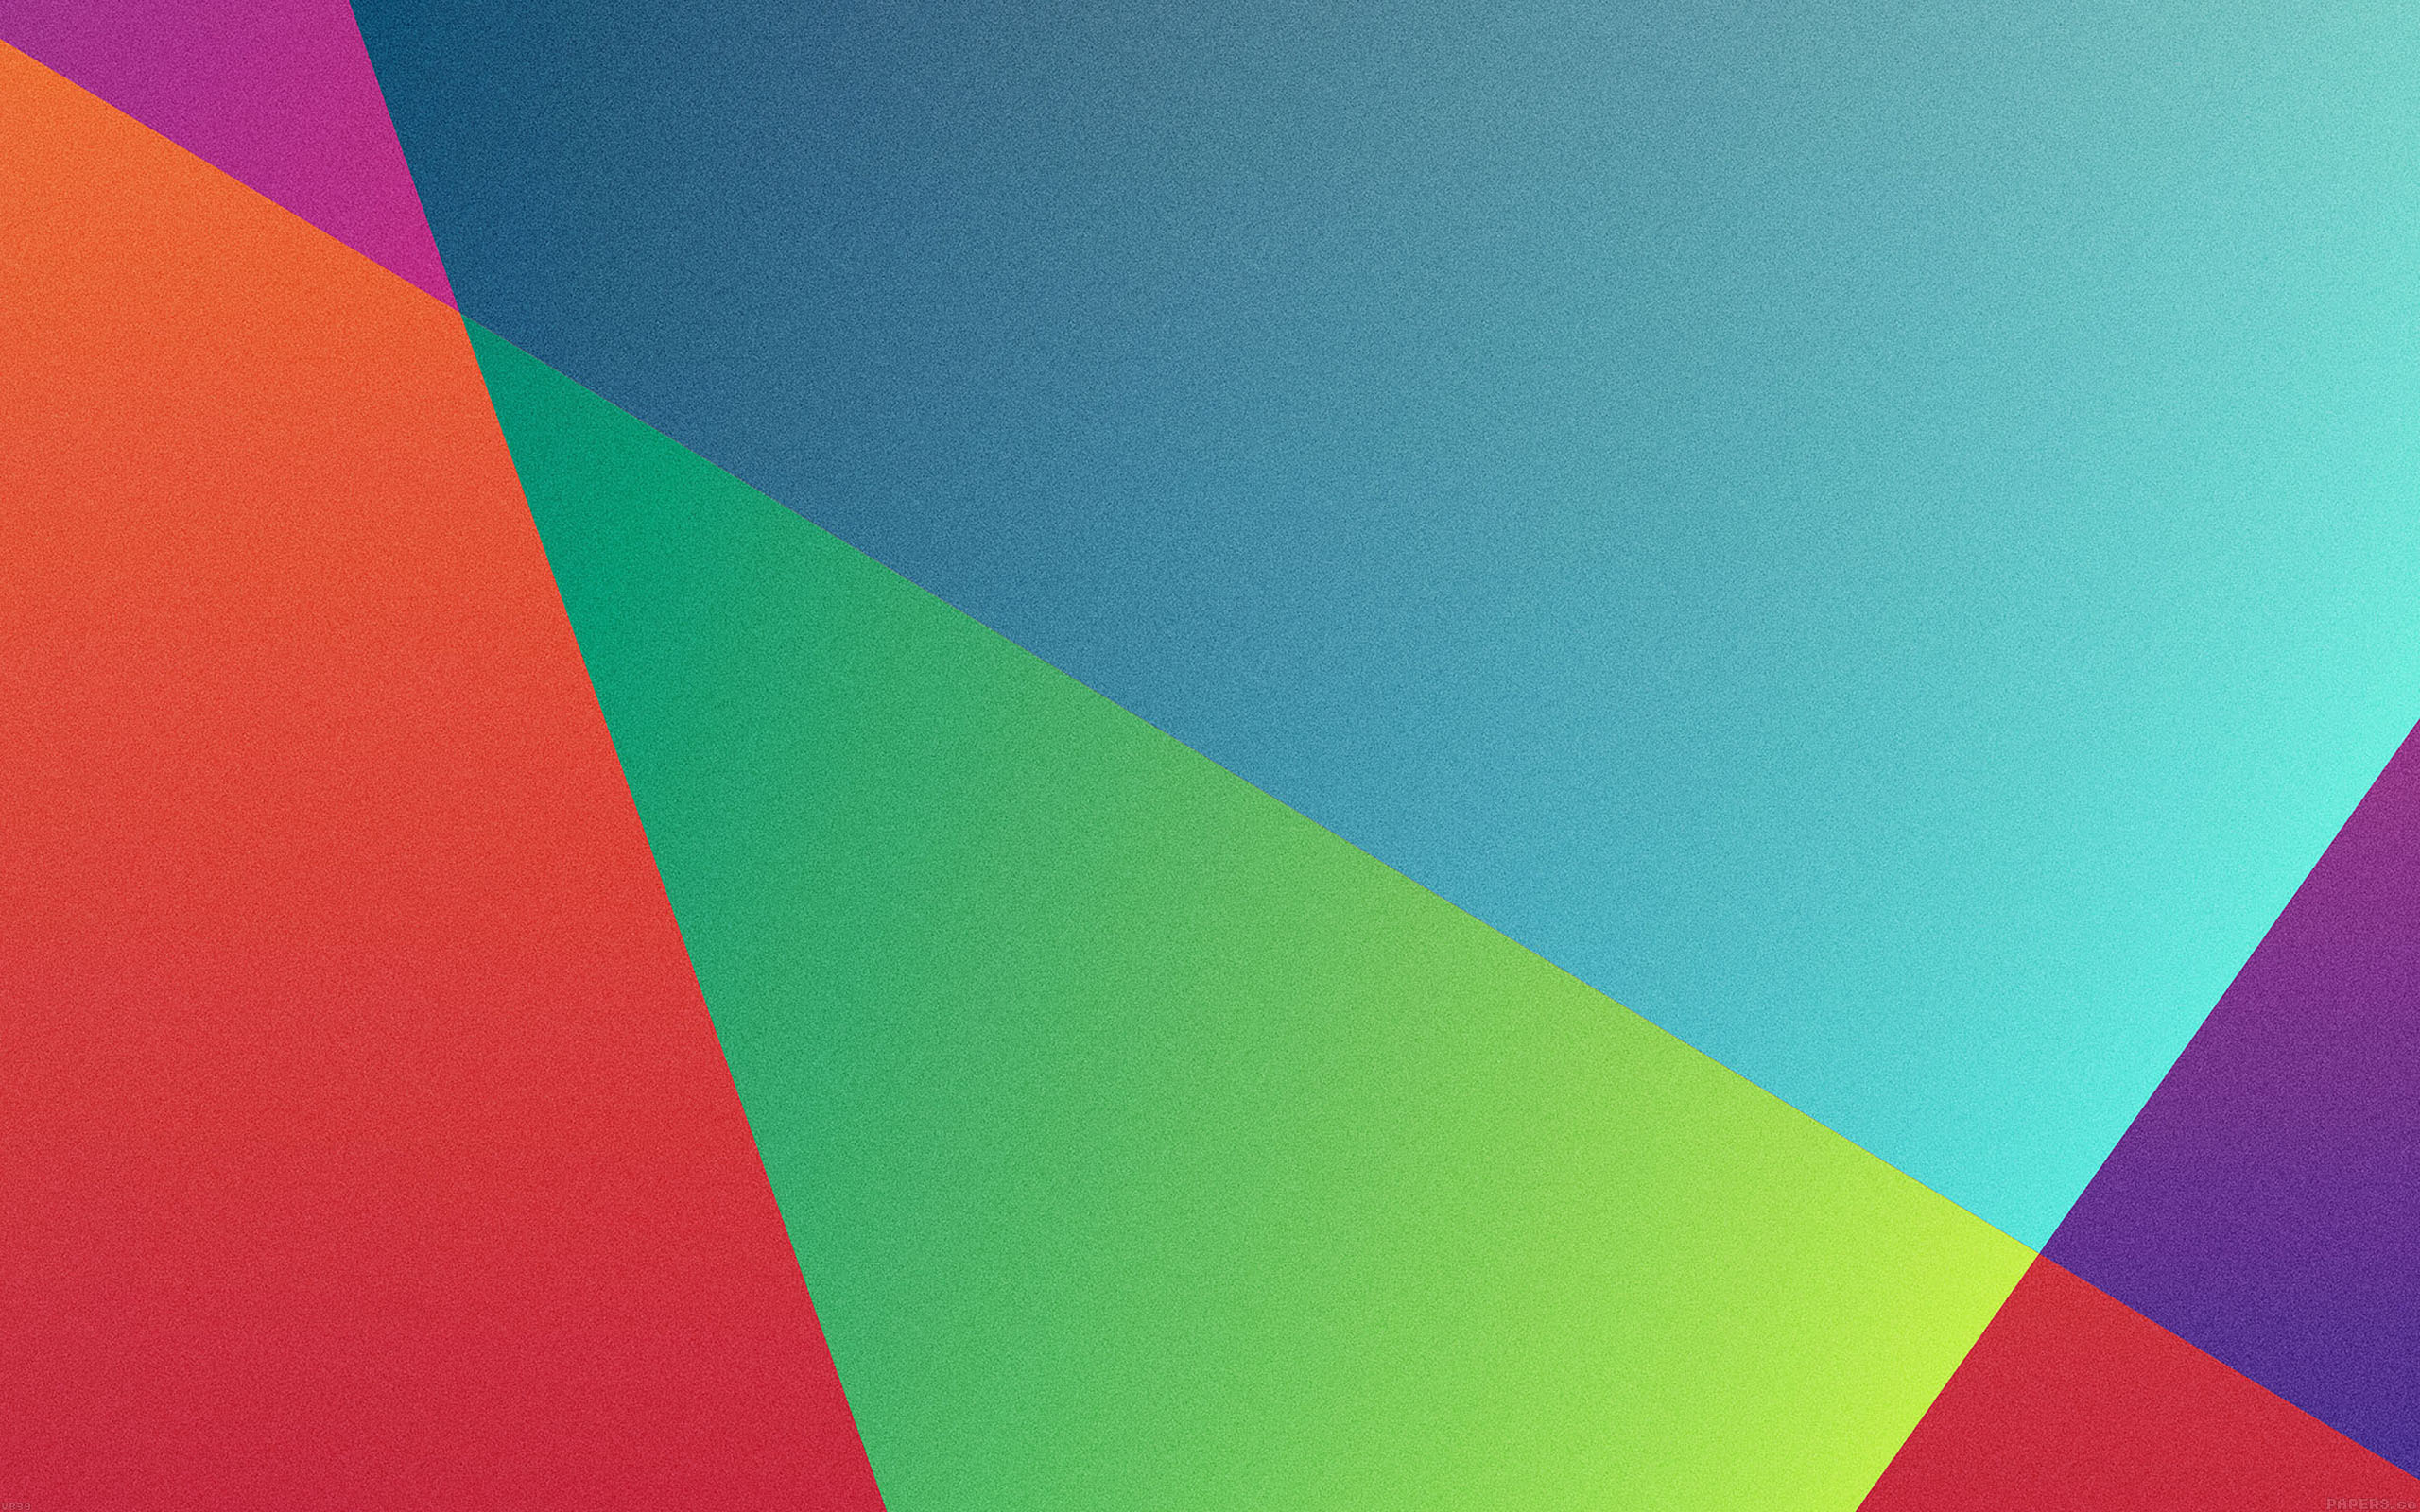 Cute Lock Screen Wallpaper For Samsung Vb39 Wallpaper G Play Pattern Wallpaper